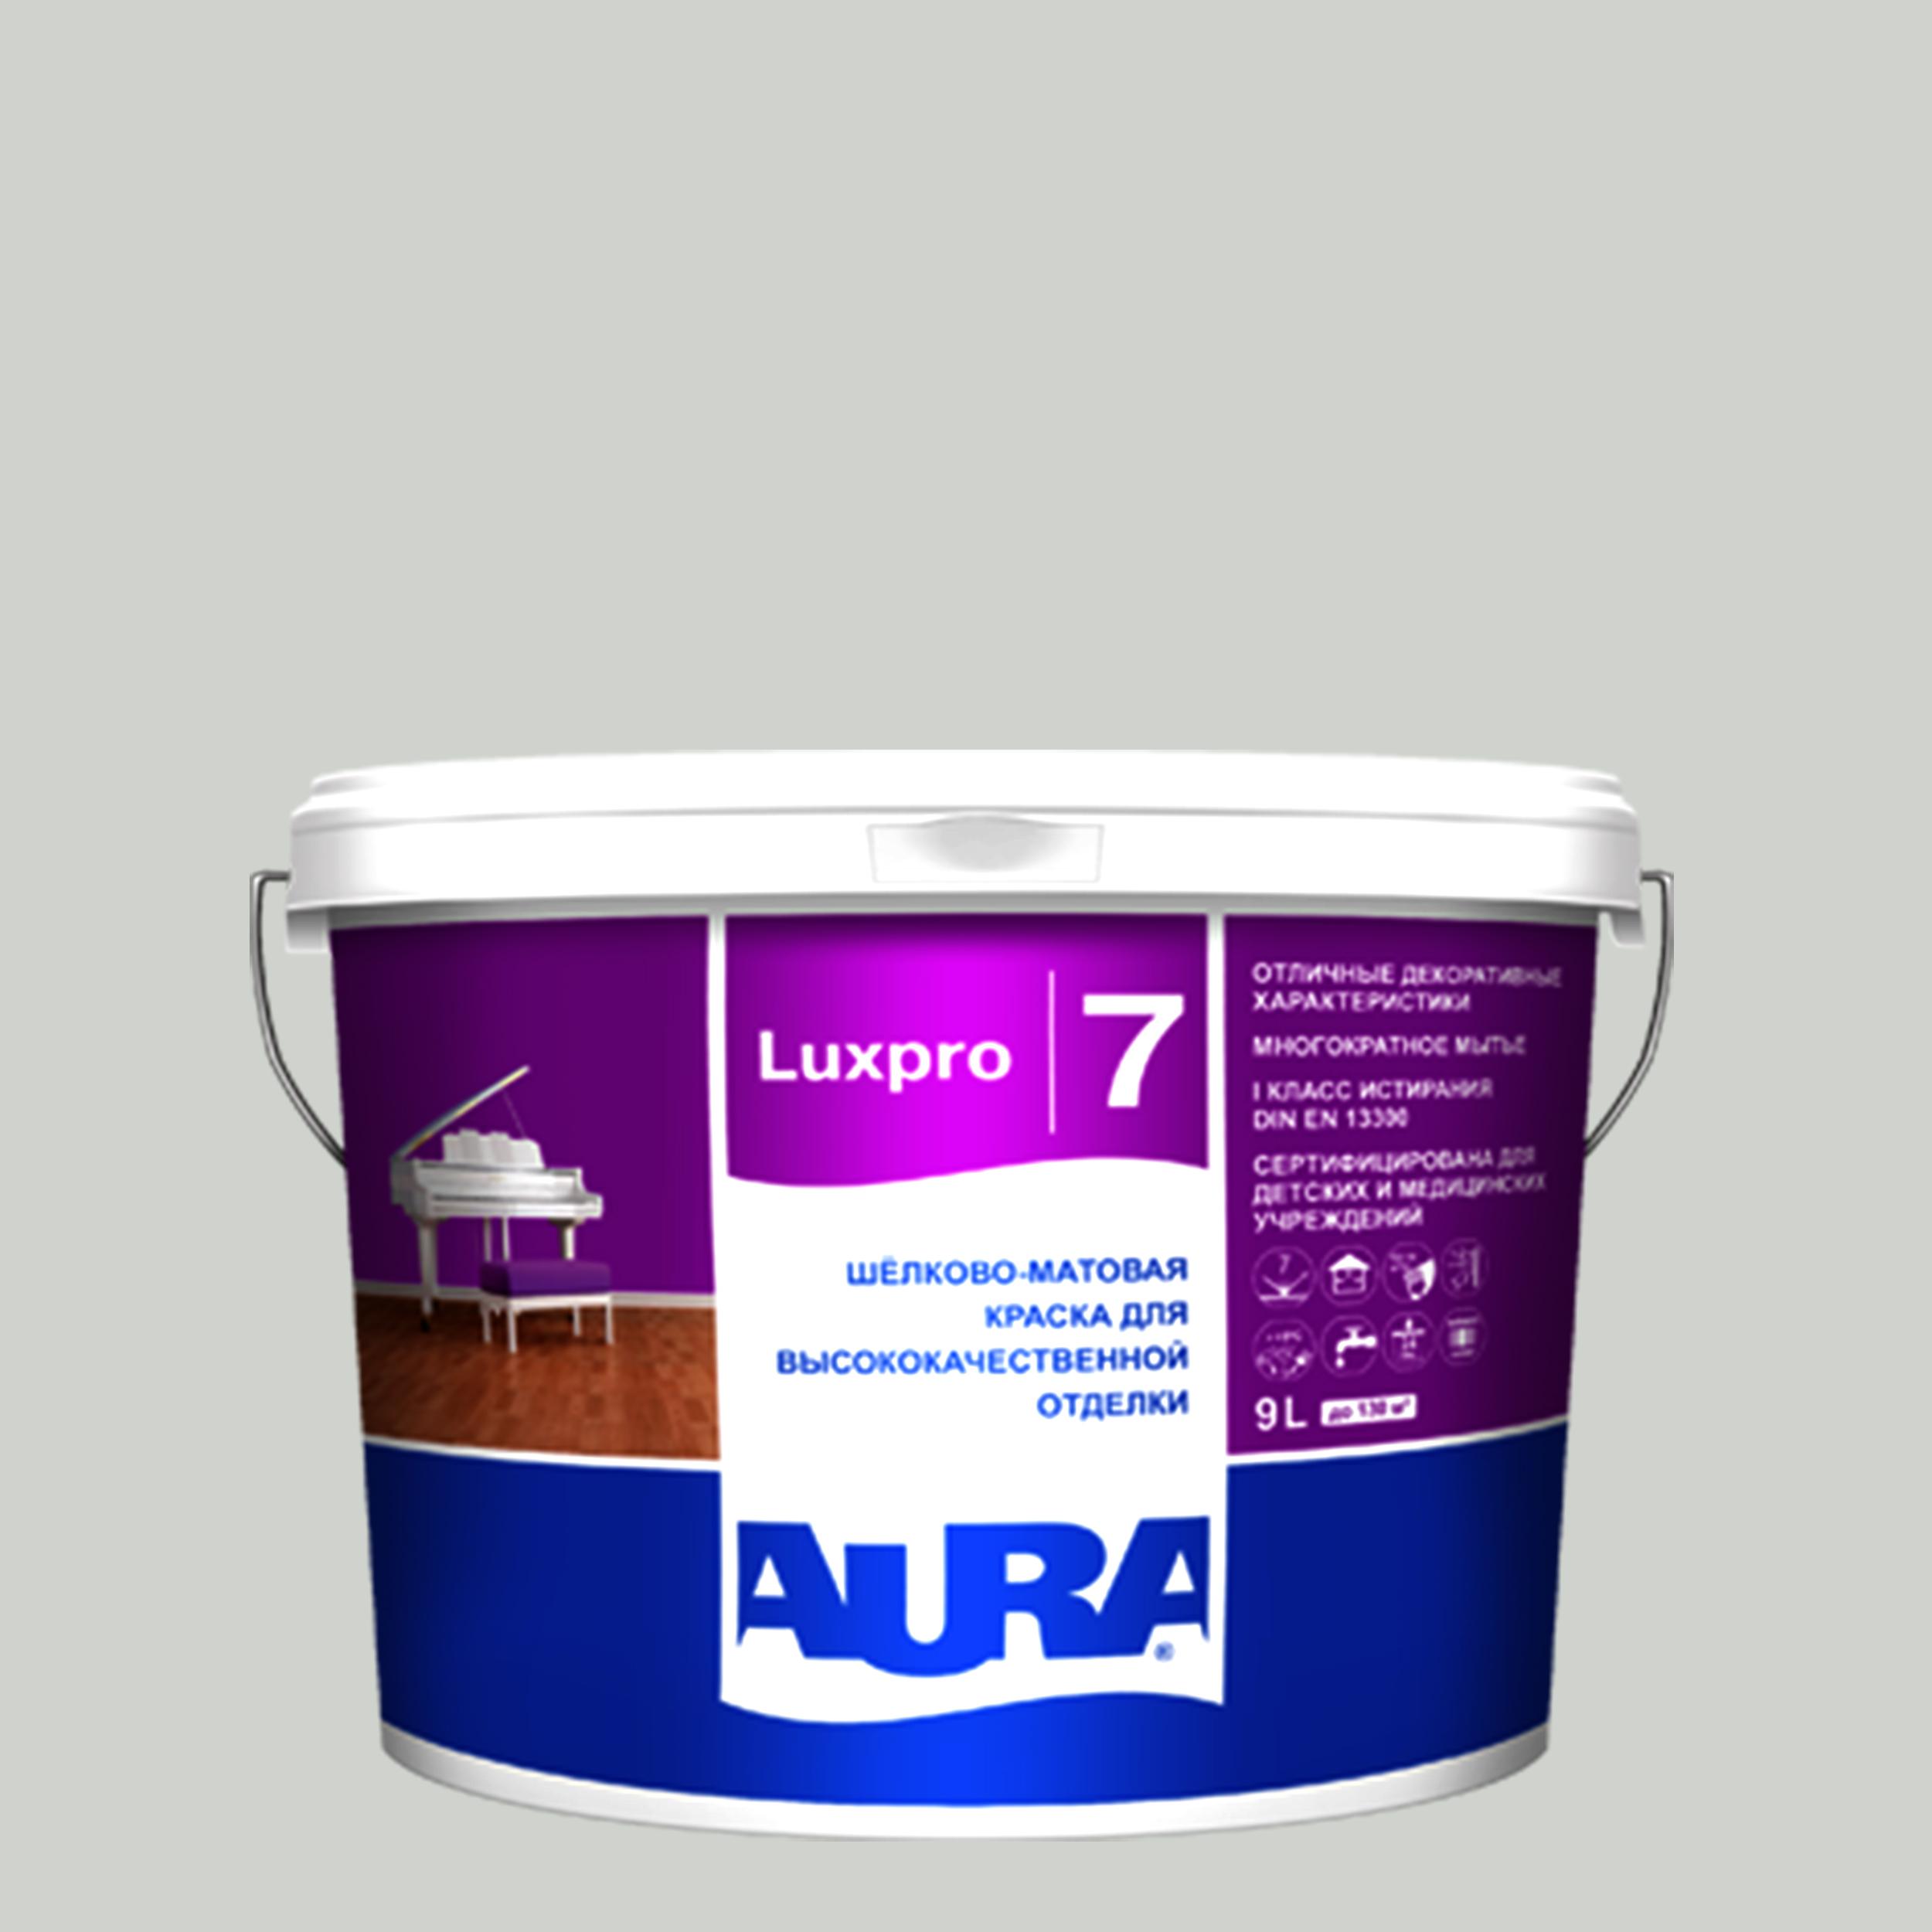 Фото 5 - Краска интерьерная, Aura LuxPRO 7, RAL 7005, 11 кг.